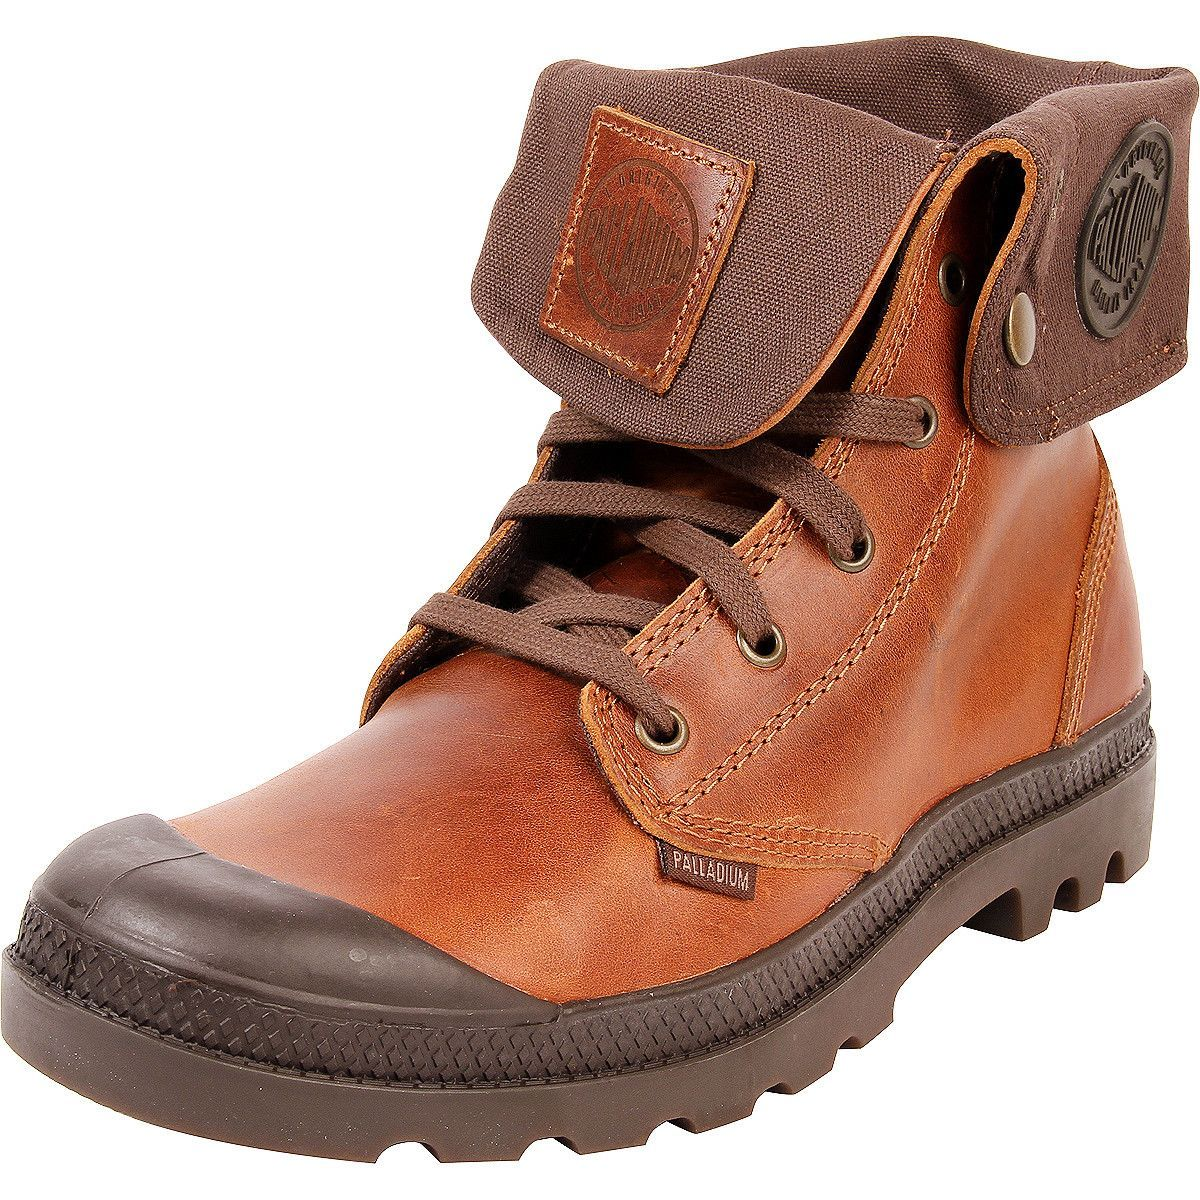 483f0b33a7a Palladium - Men's Baggy Leather Boots - Sunrise/Chocolate | Dapper ...